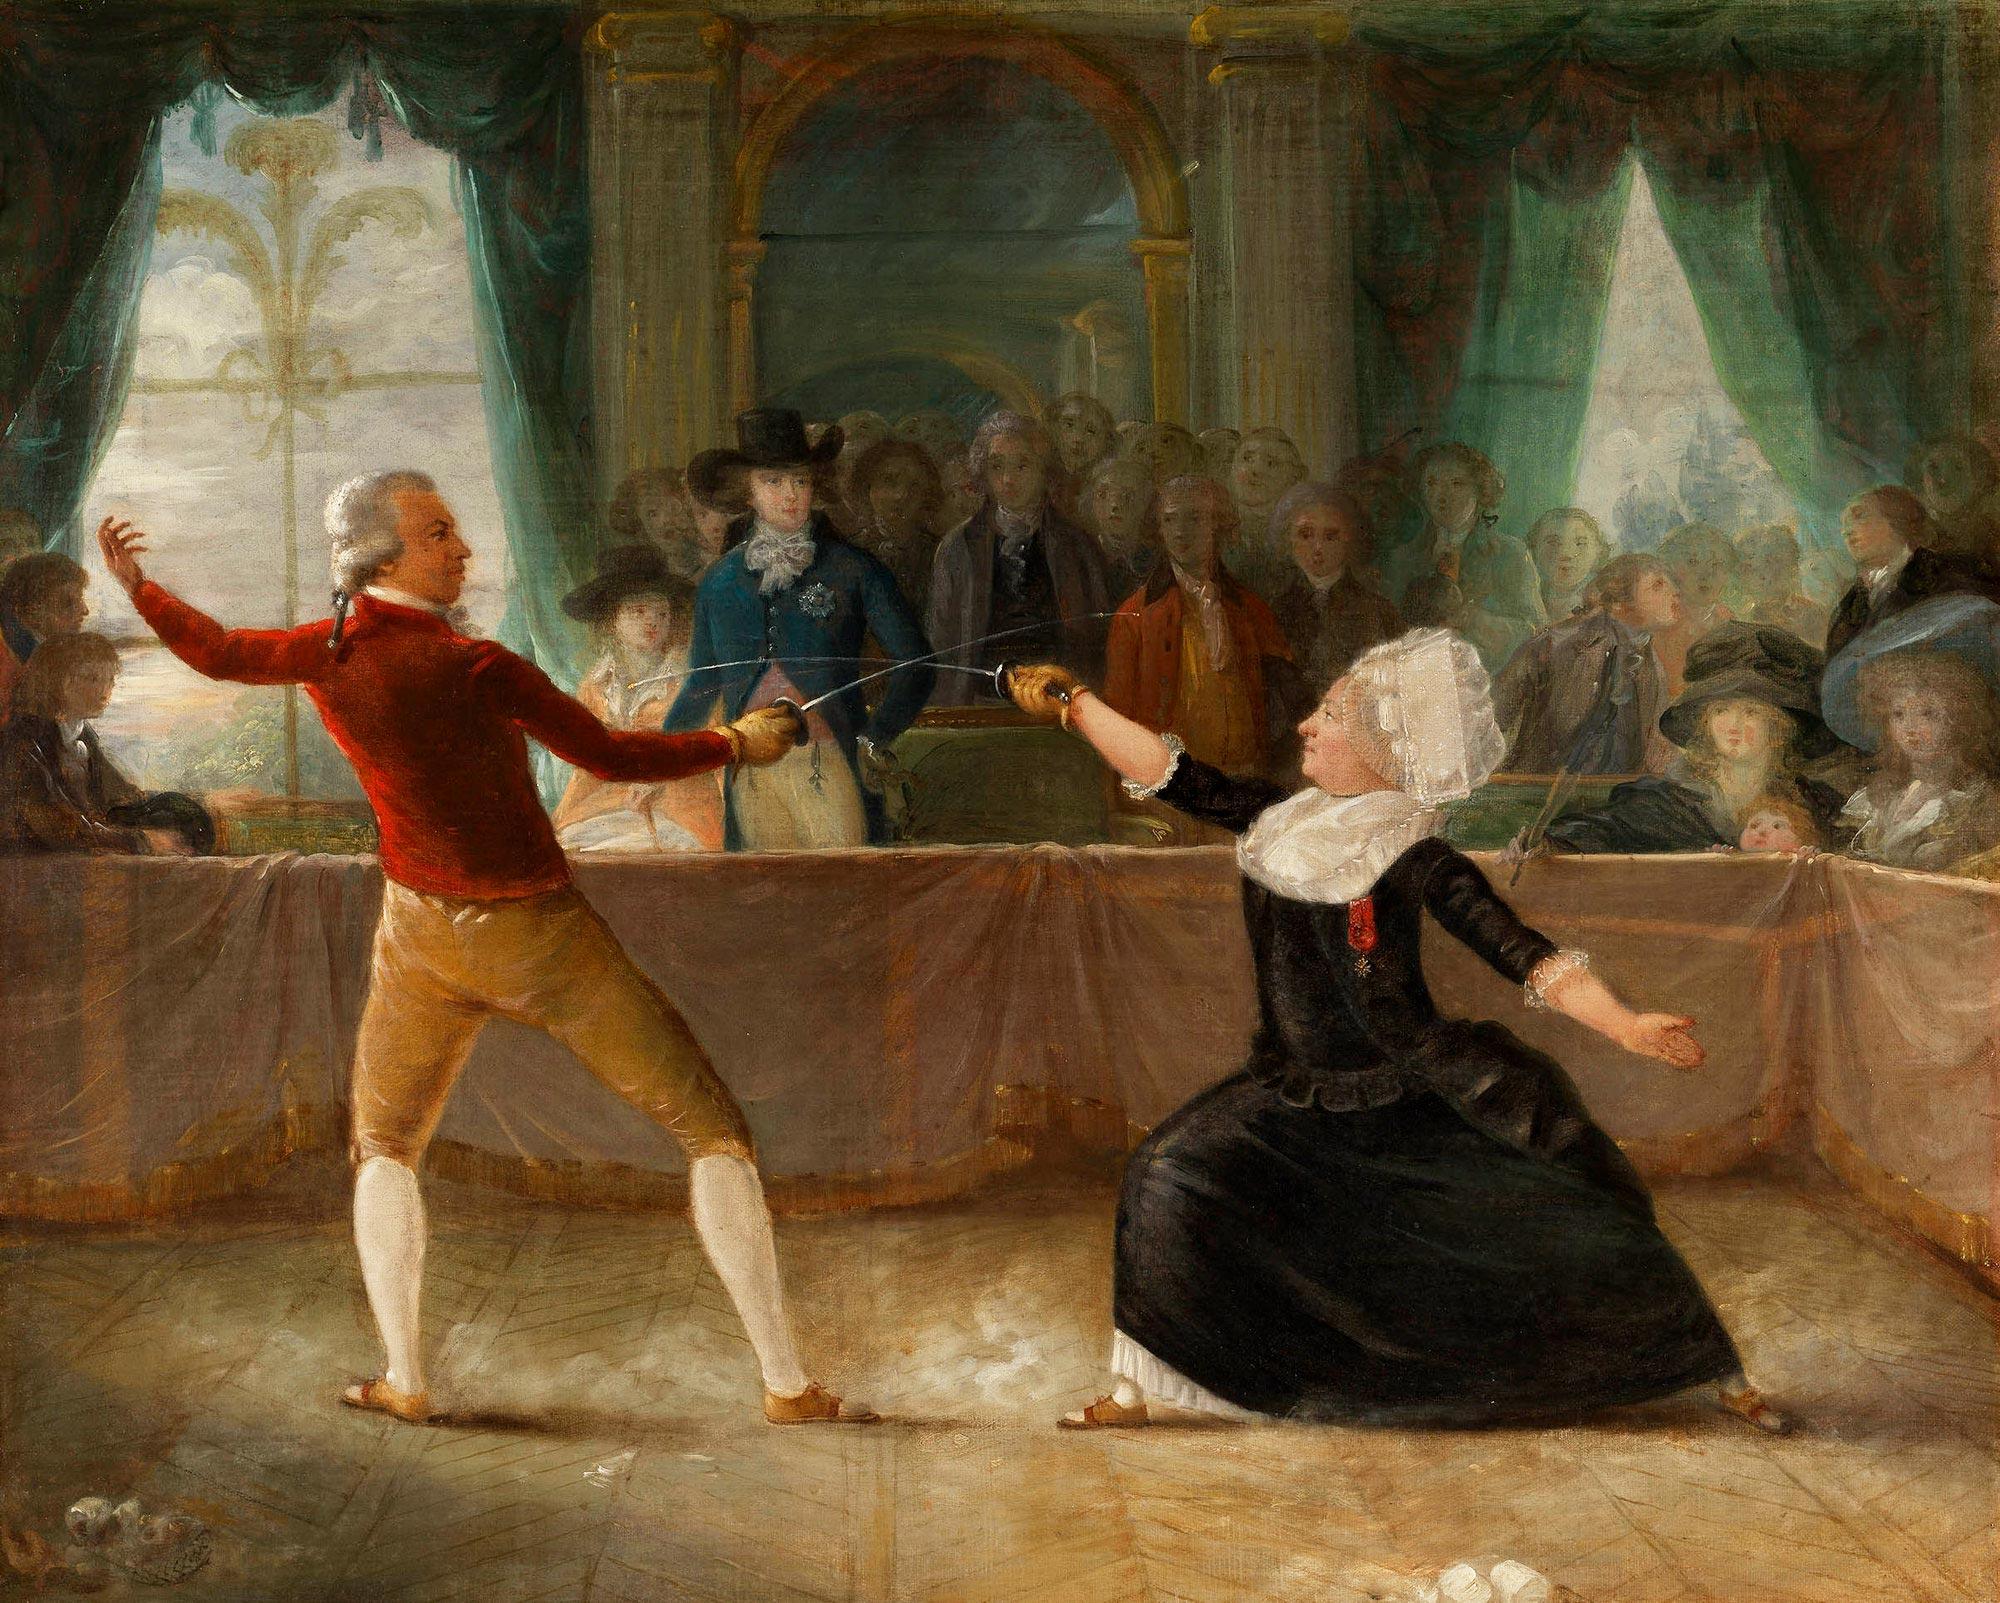 El caballero d'Eon contra el caballero de Saint Georges, cuadro del pintor francés Alexandre Auguste Robineau